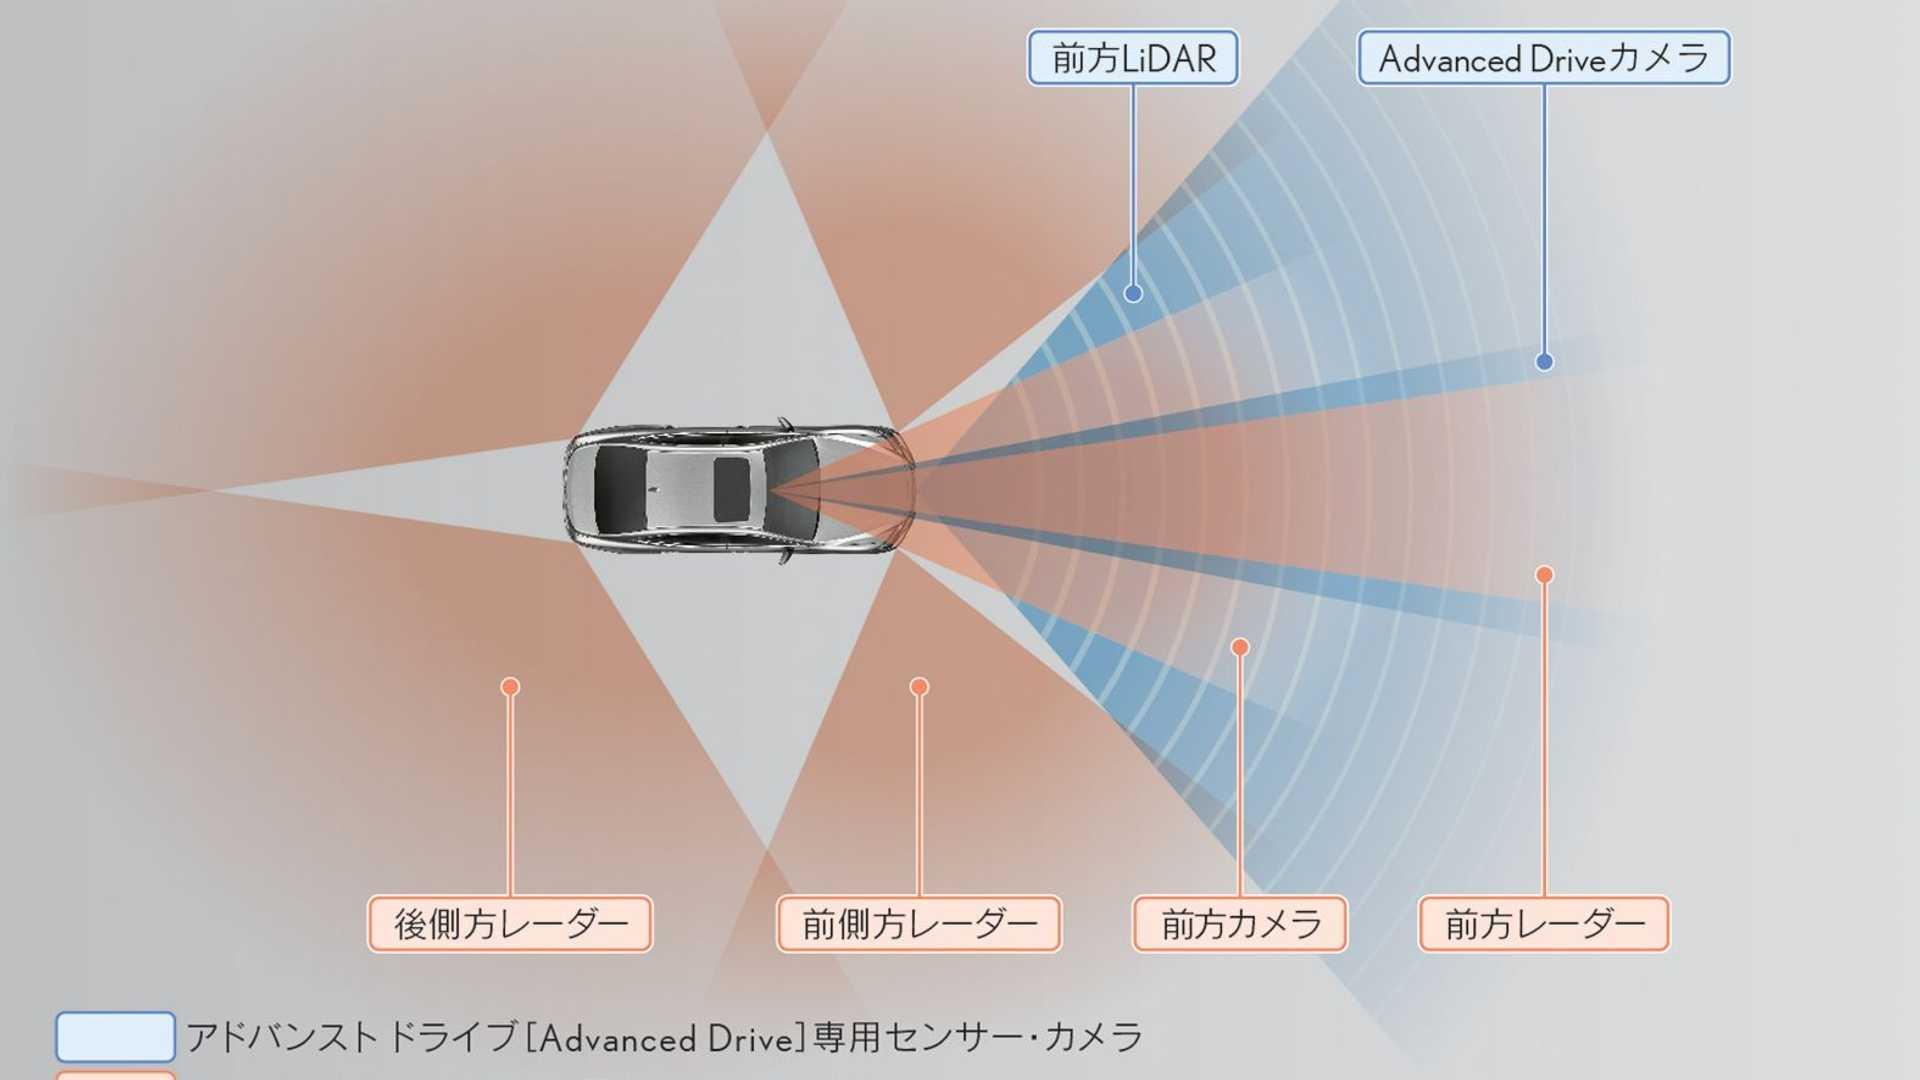 Lexus-LS-And-Toyota-Mirai-Advanced-Drive-37